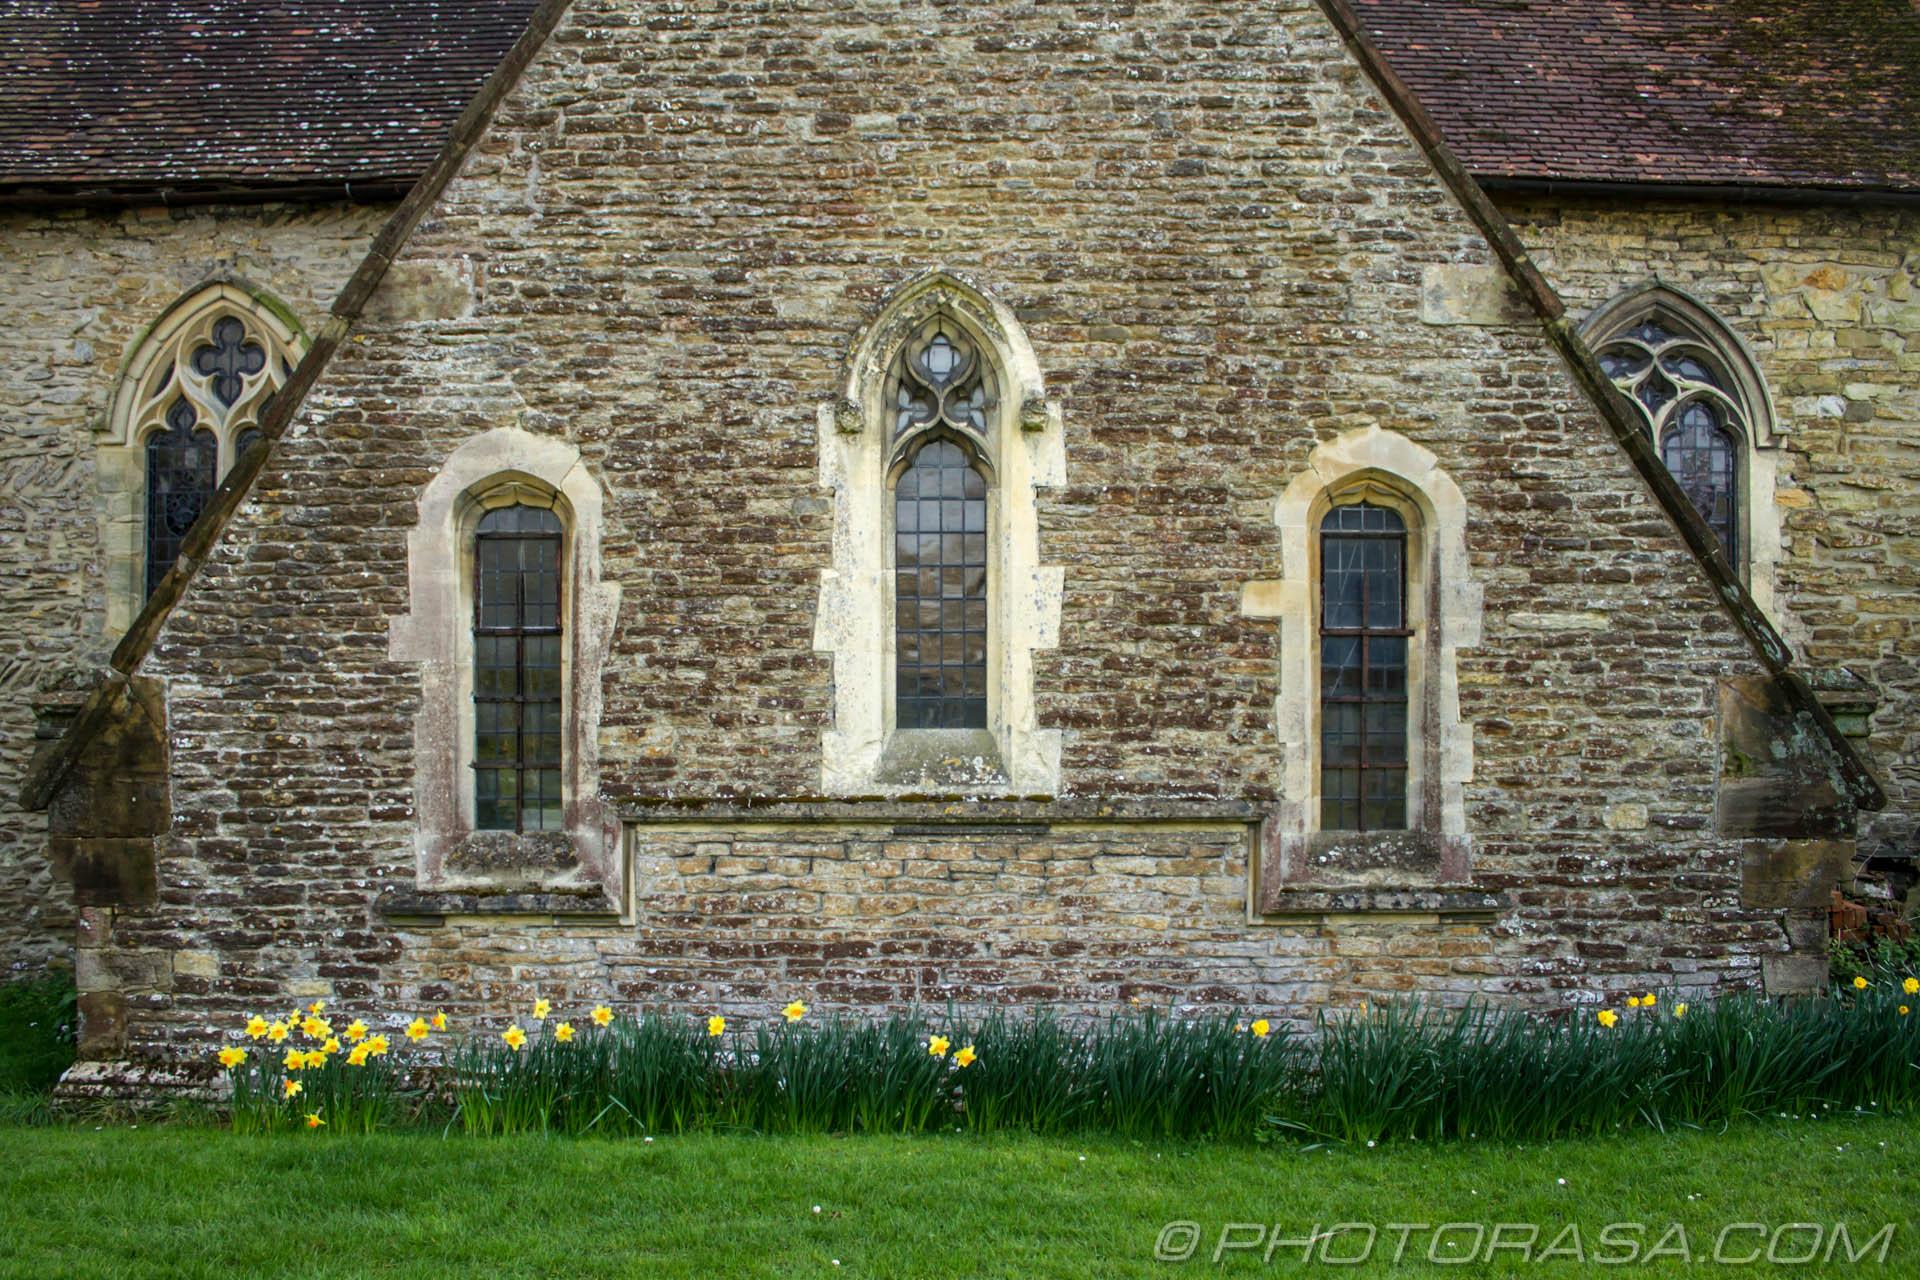 https://photorasa.com/saints-church-staplehurst-kent/three-windows/